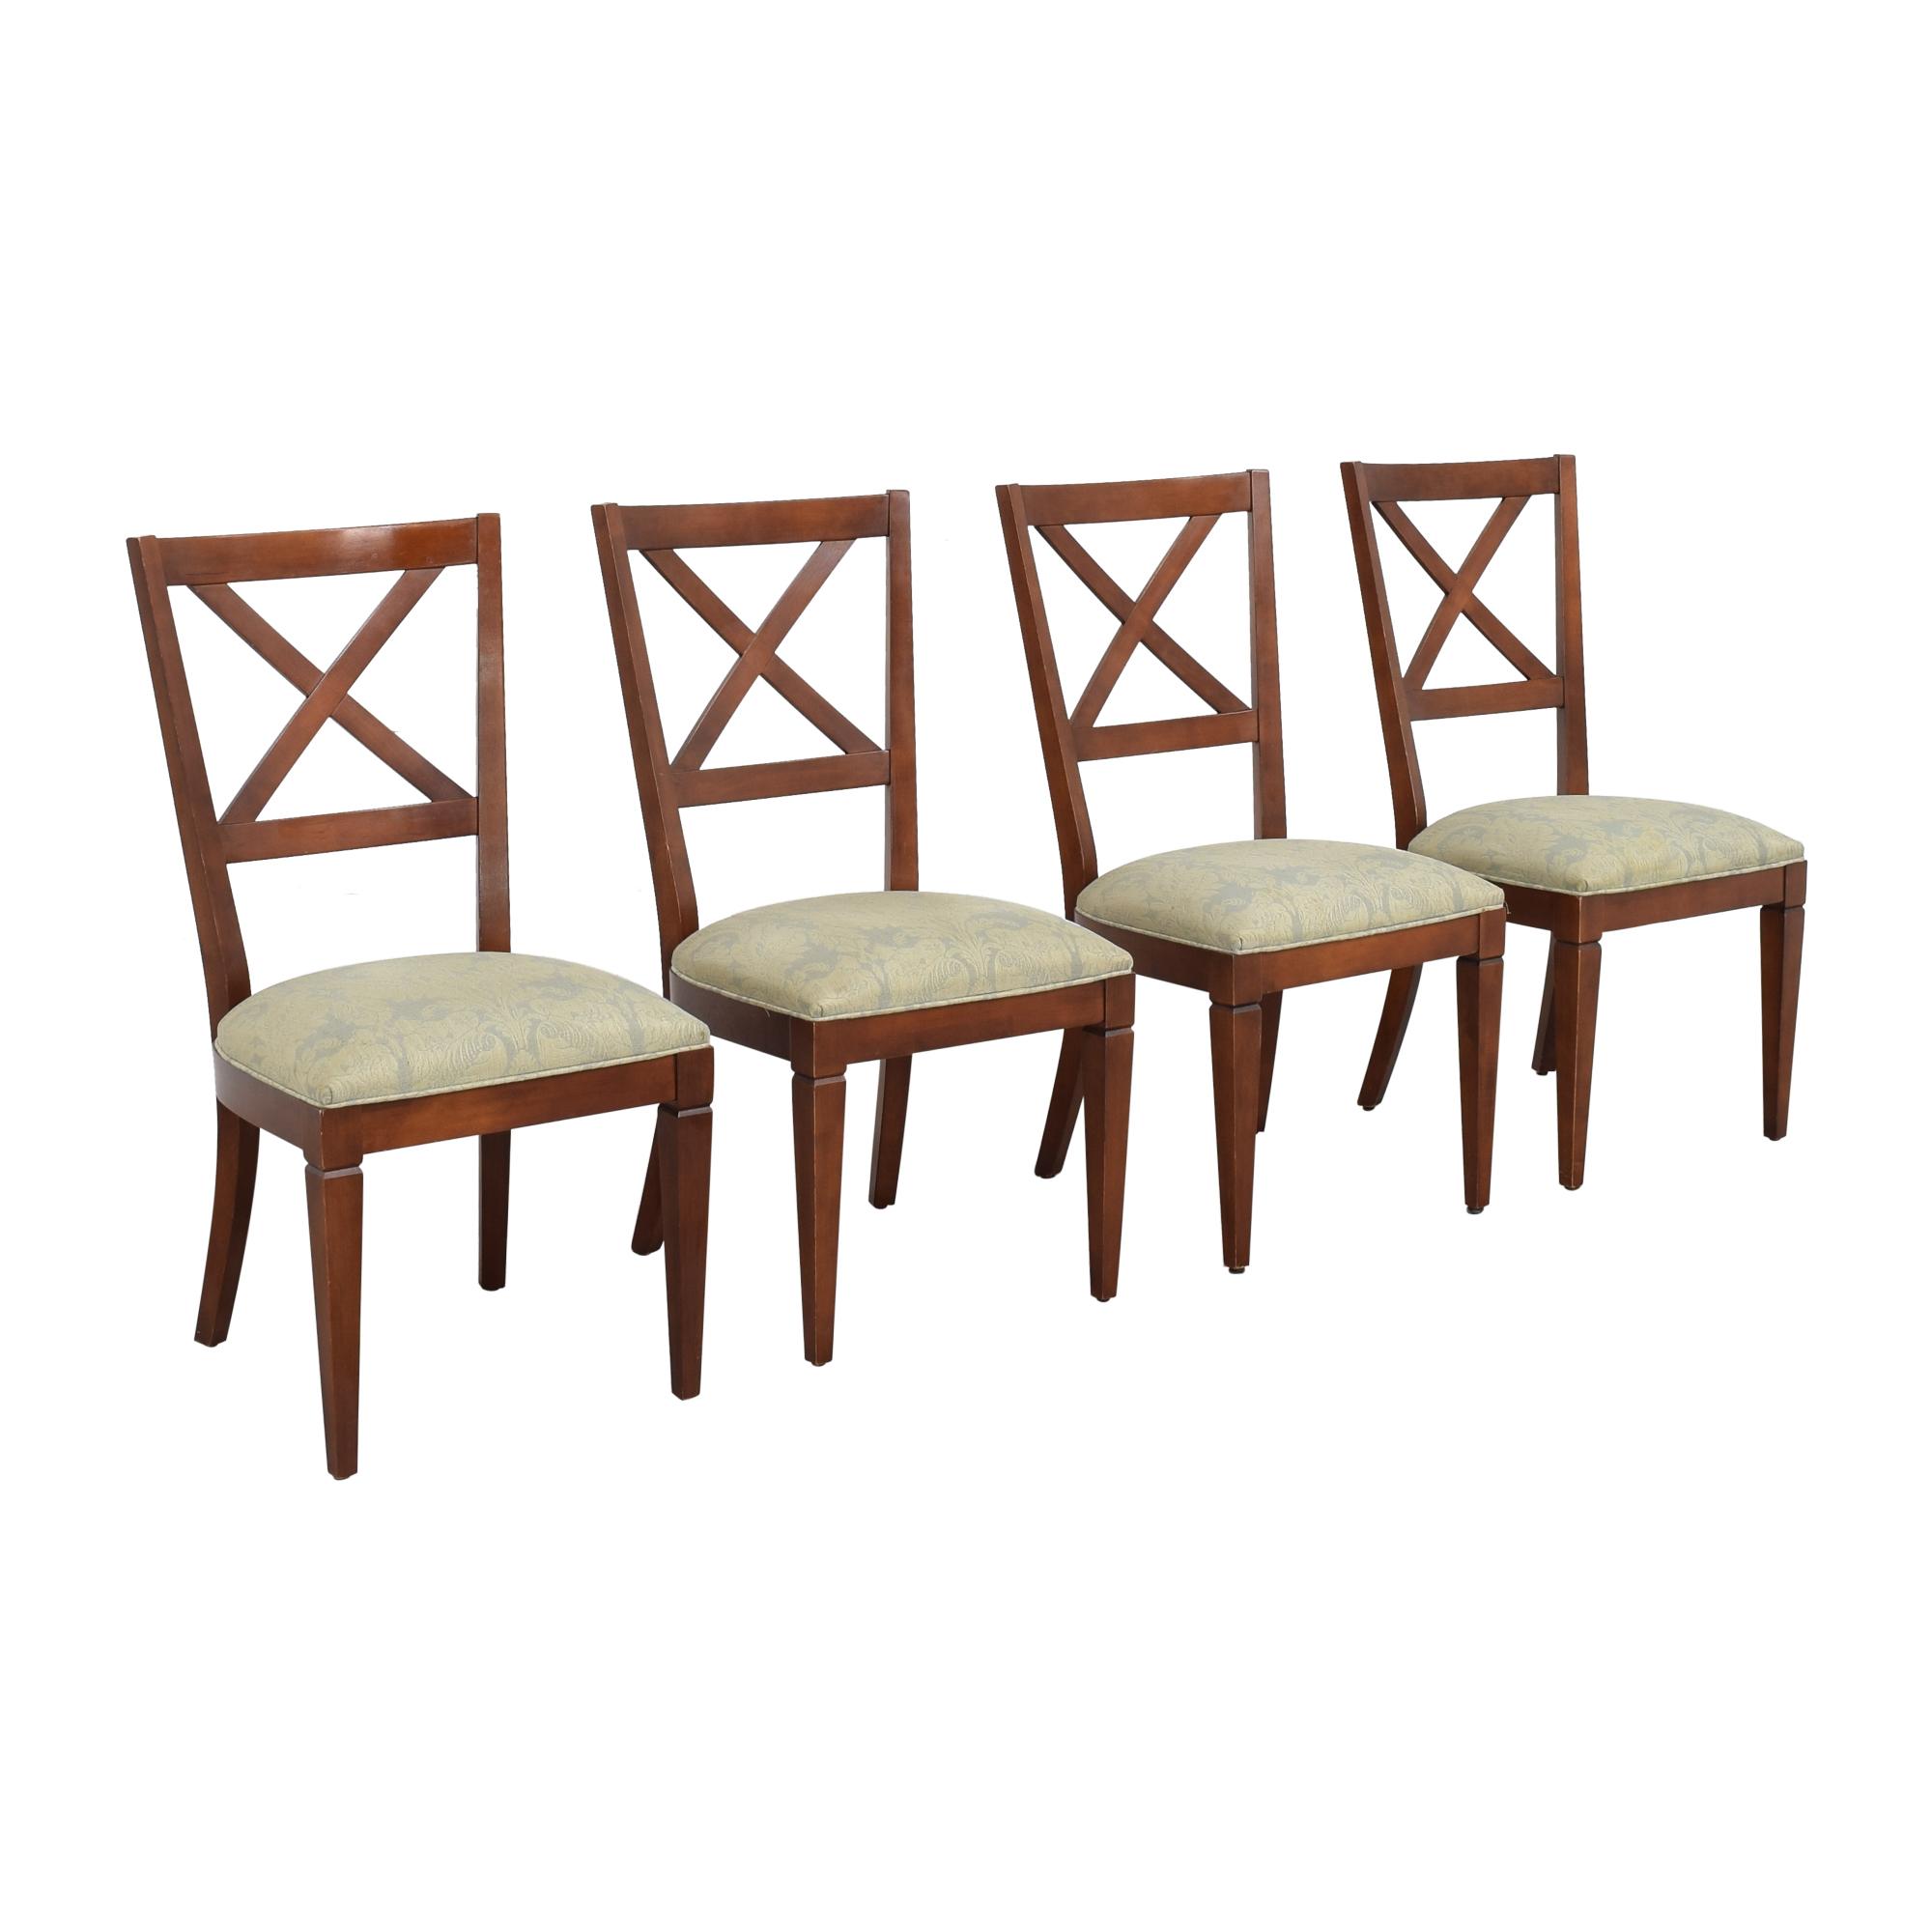 Ethan Allen Ethan Allen Dining Chairs ct